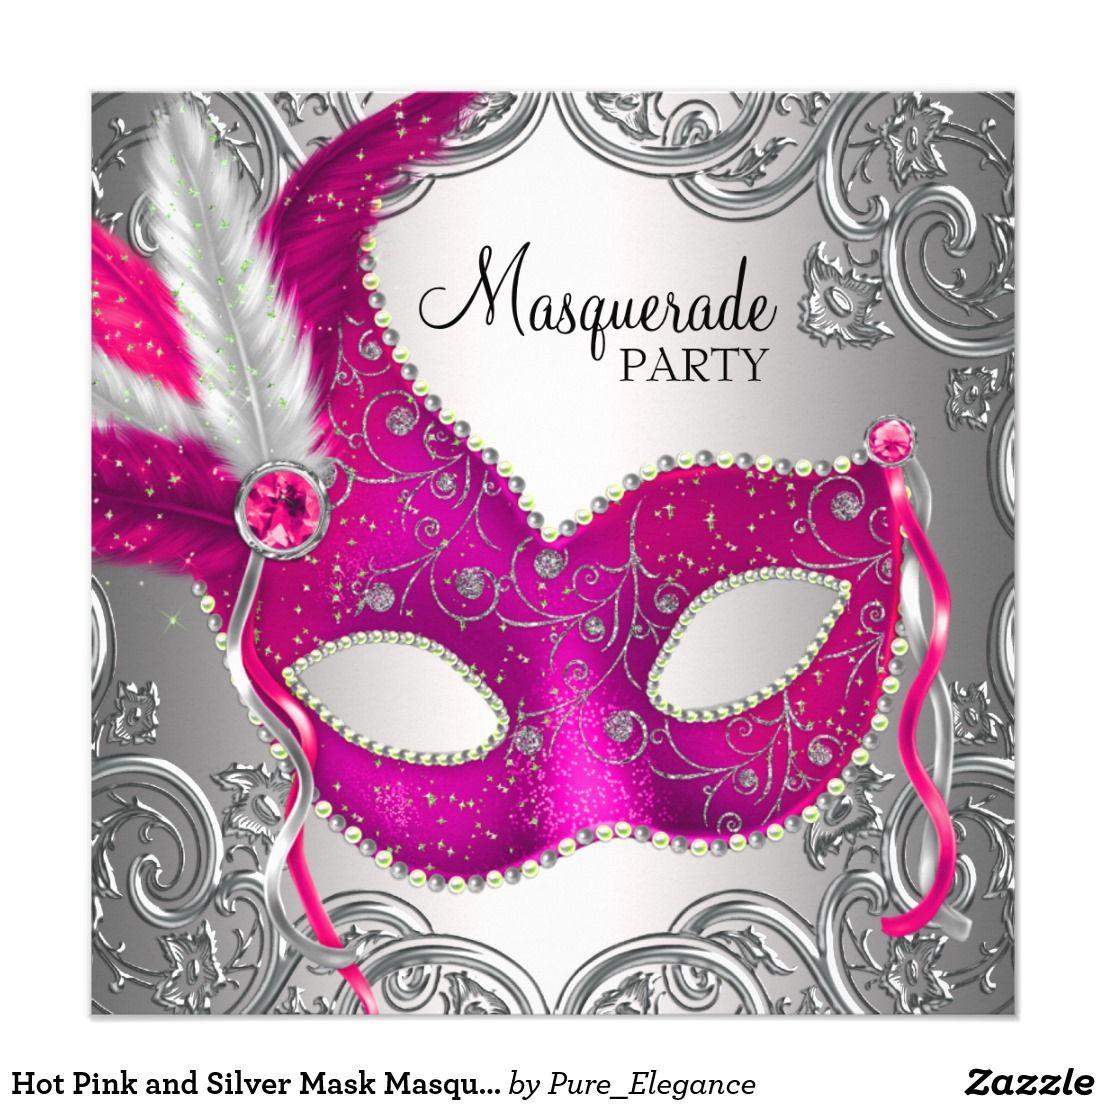 Hot Pink and Silver Mask Masquerade Party Card | Masquerade party ...